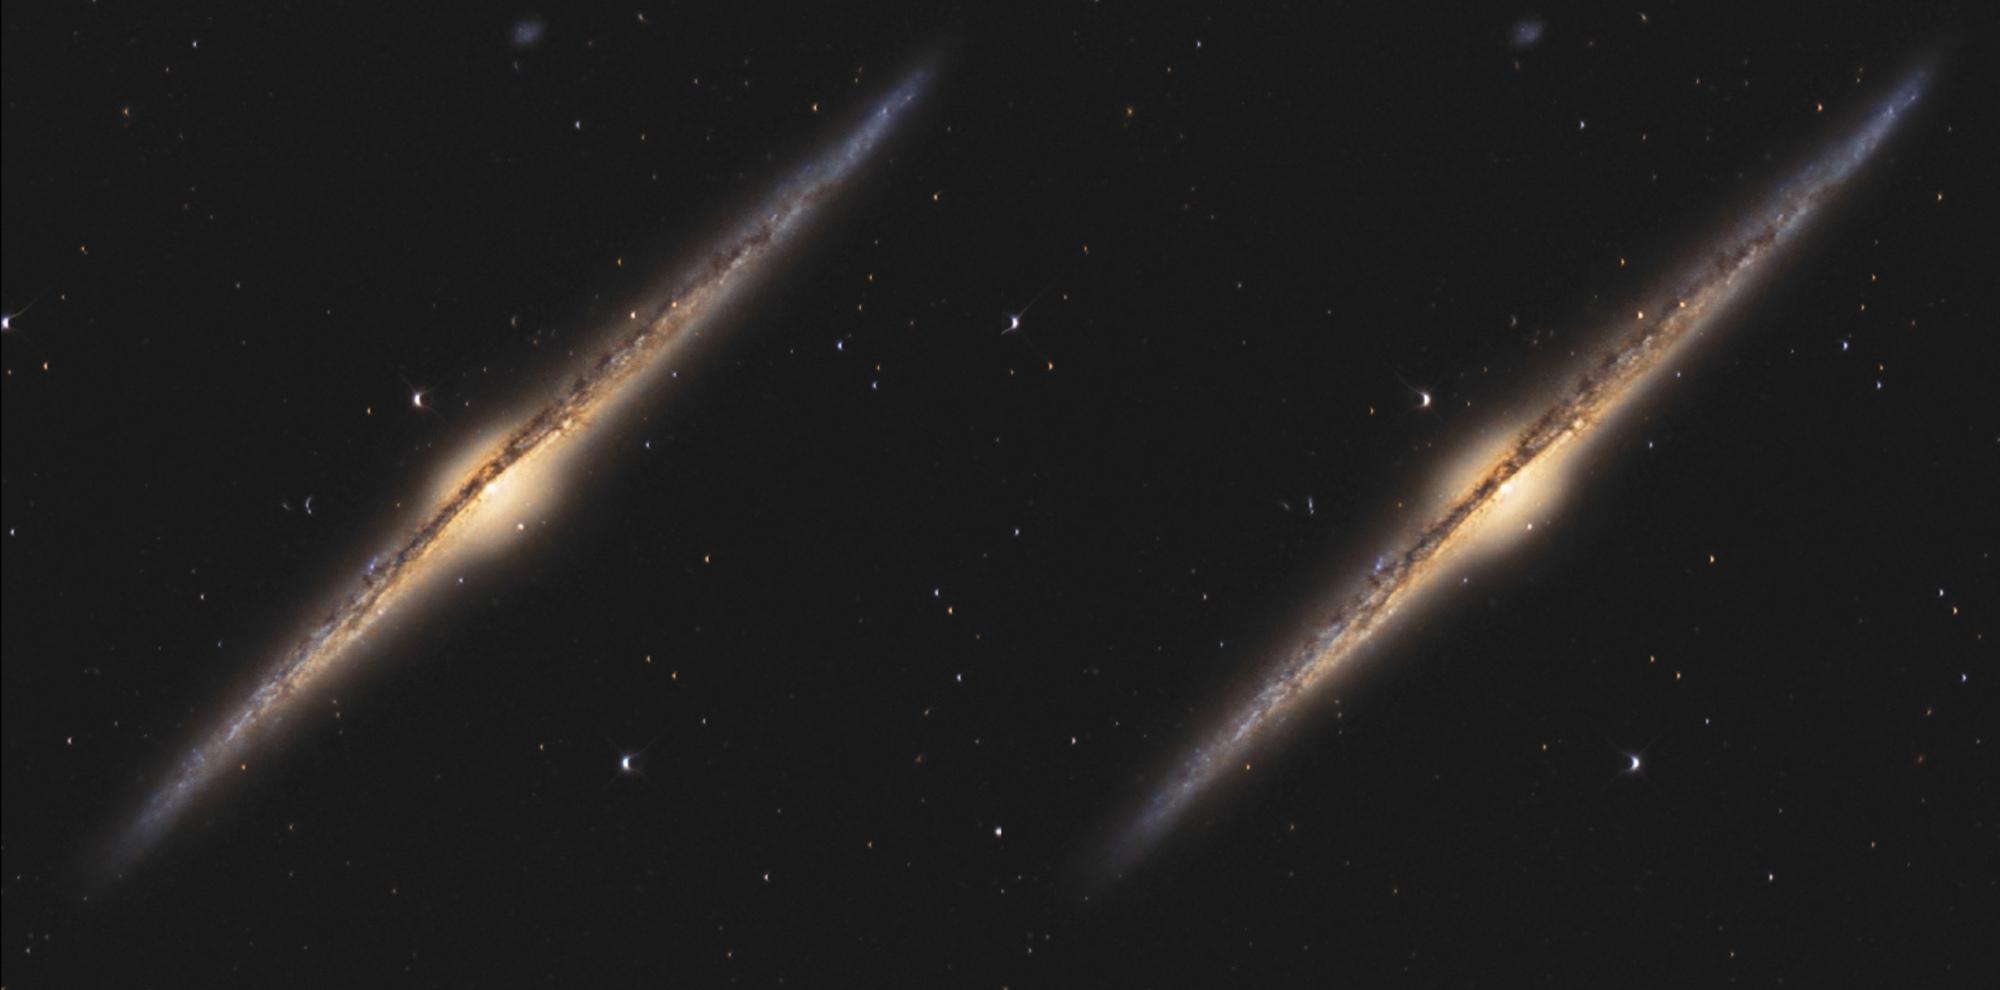 5f3542055d722_NGC45653D.thumb.jpg.e424aaa8cabae48b176d51560ea77cef.jpg